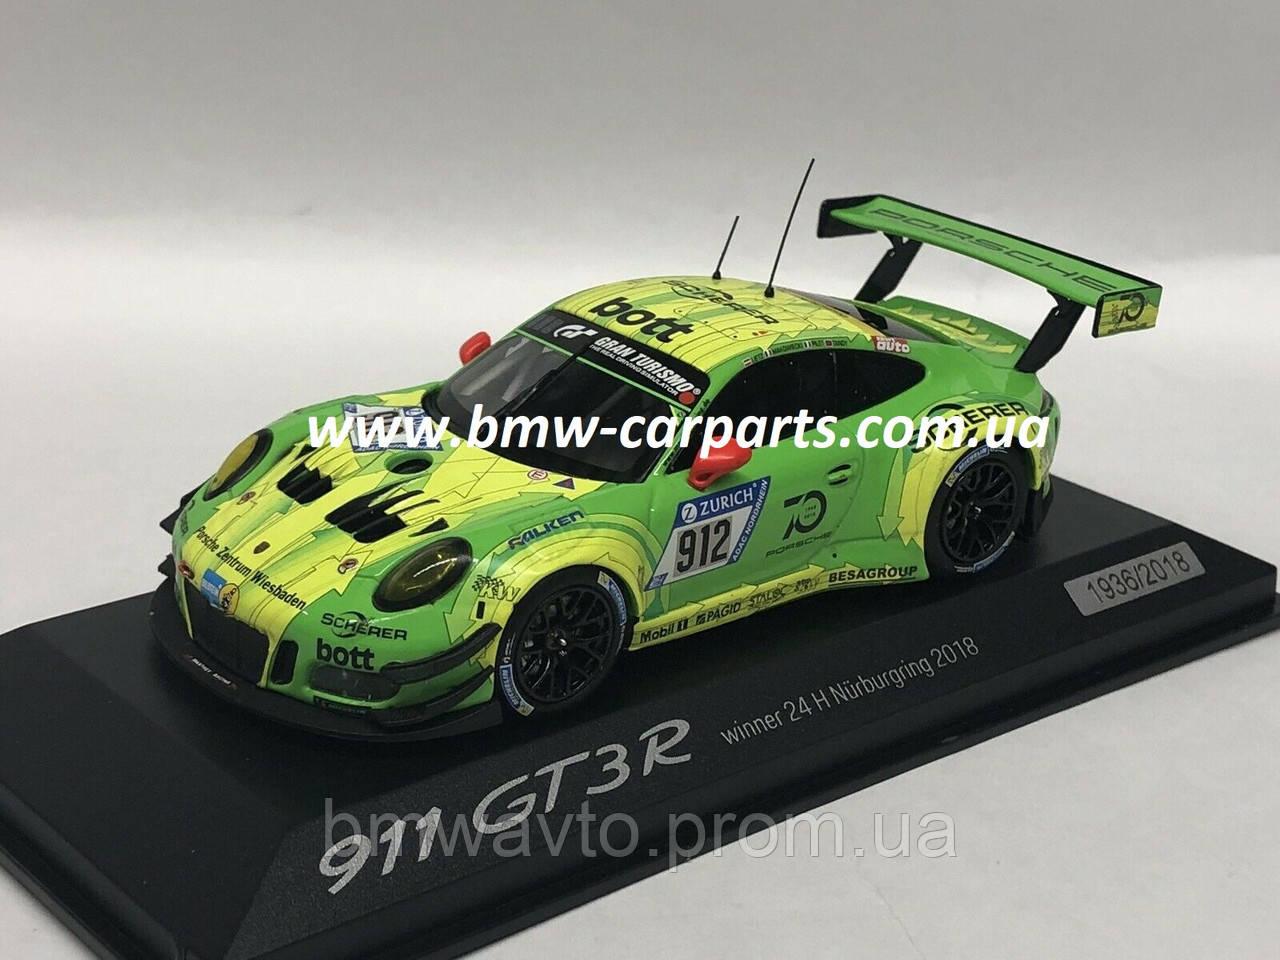 Модель автомобиля Porsche 911 GT3 R №912, Winner 24h Nurburgring